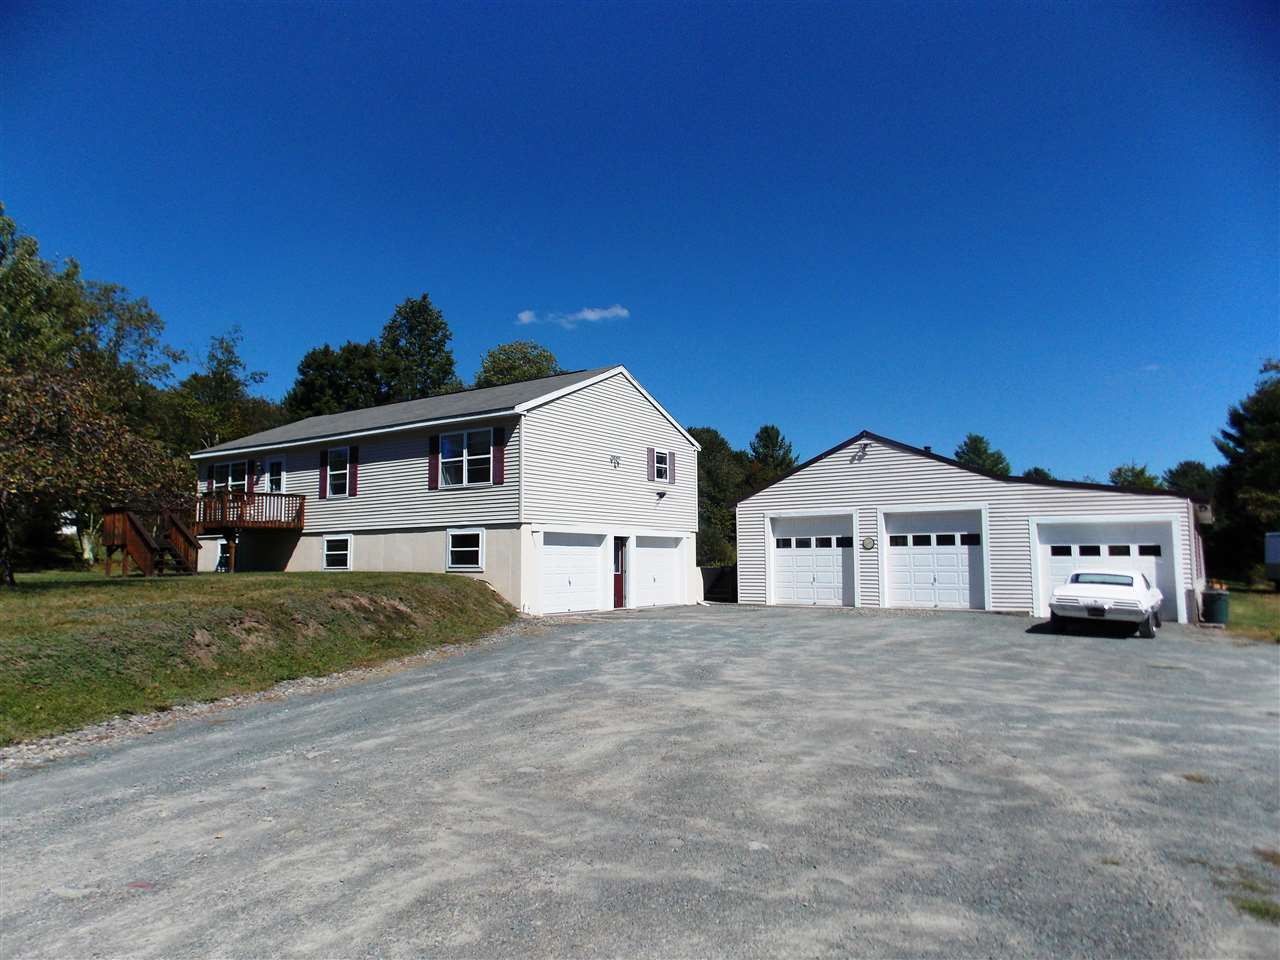 Real Estate for Sale, ListingId: 35479306, Woodbourne,NY12788